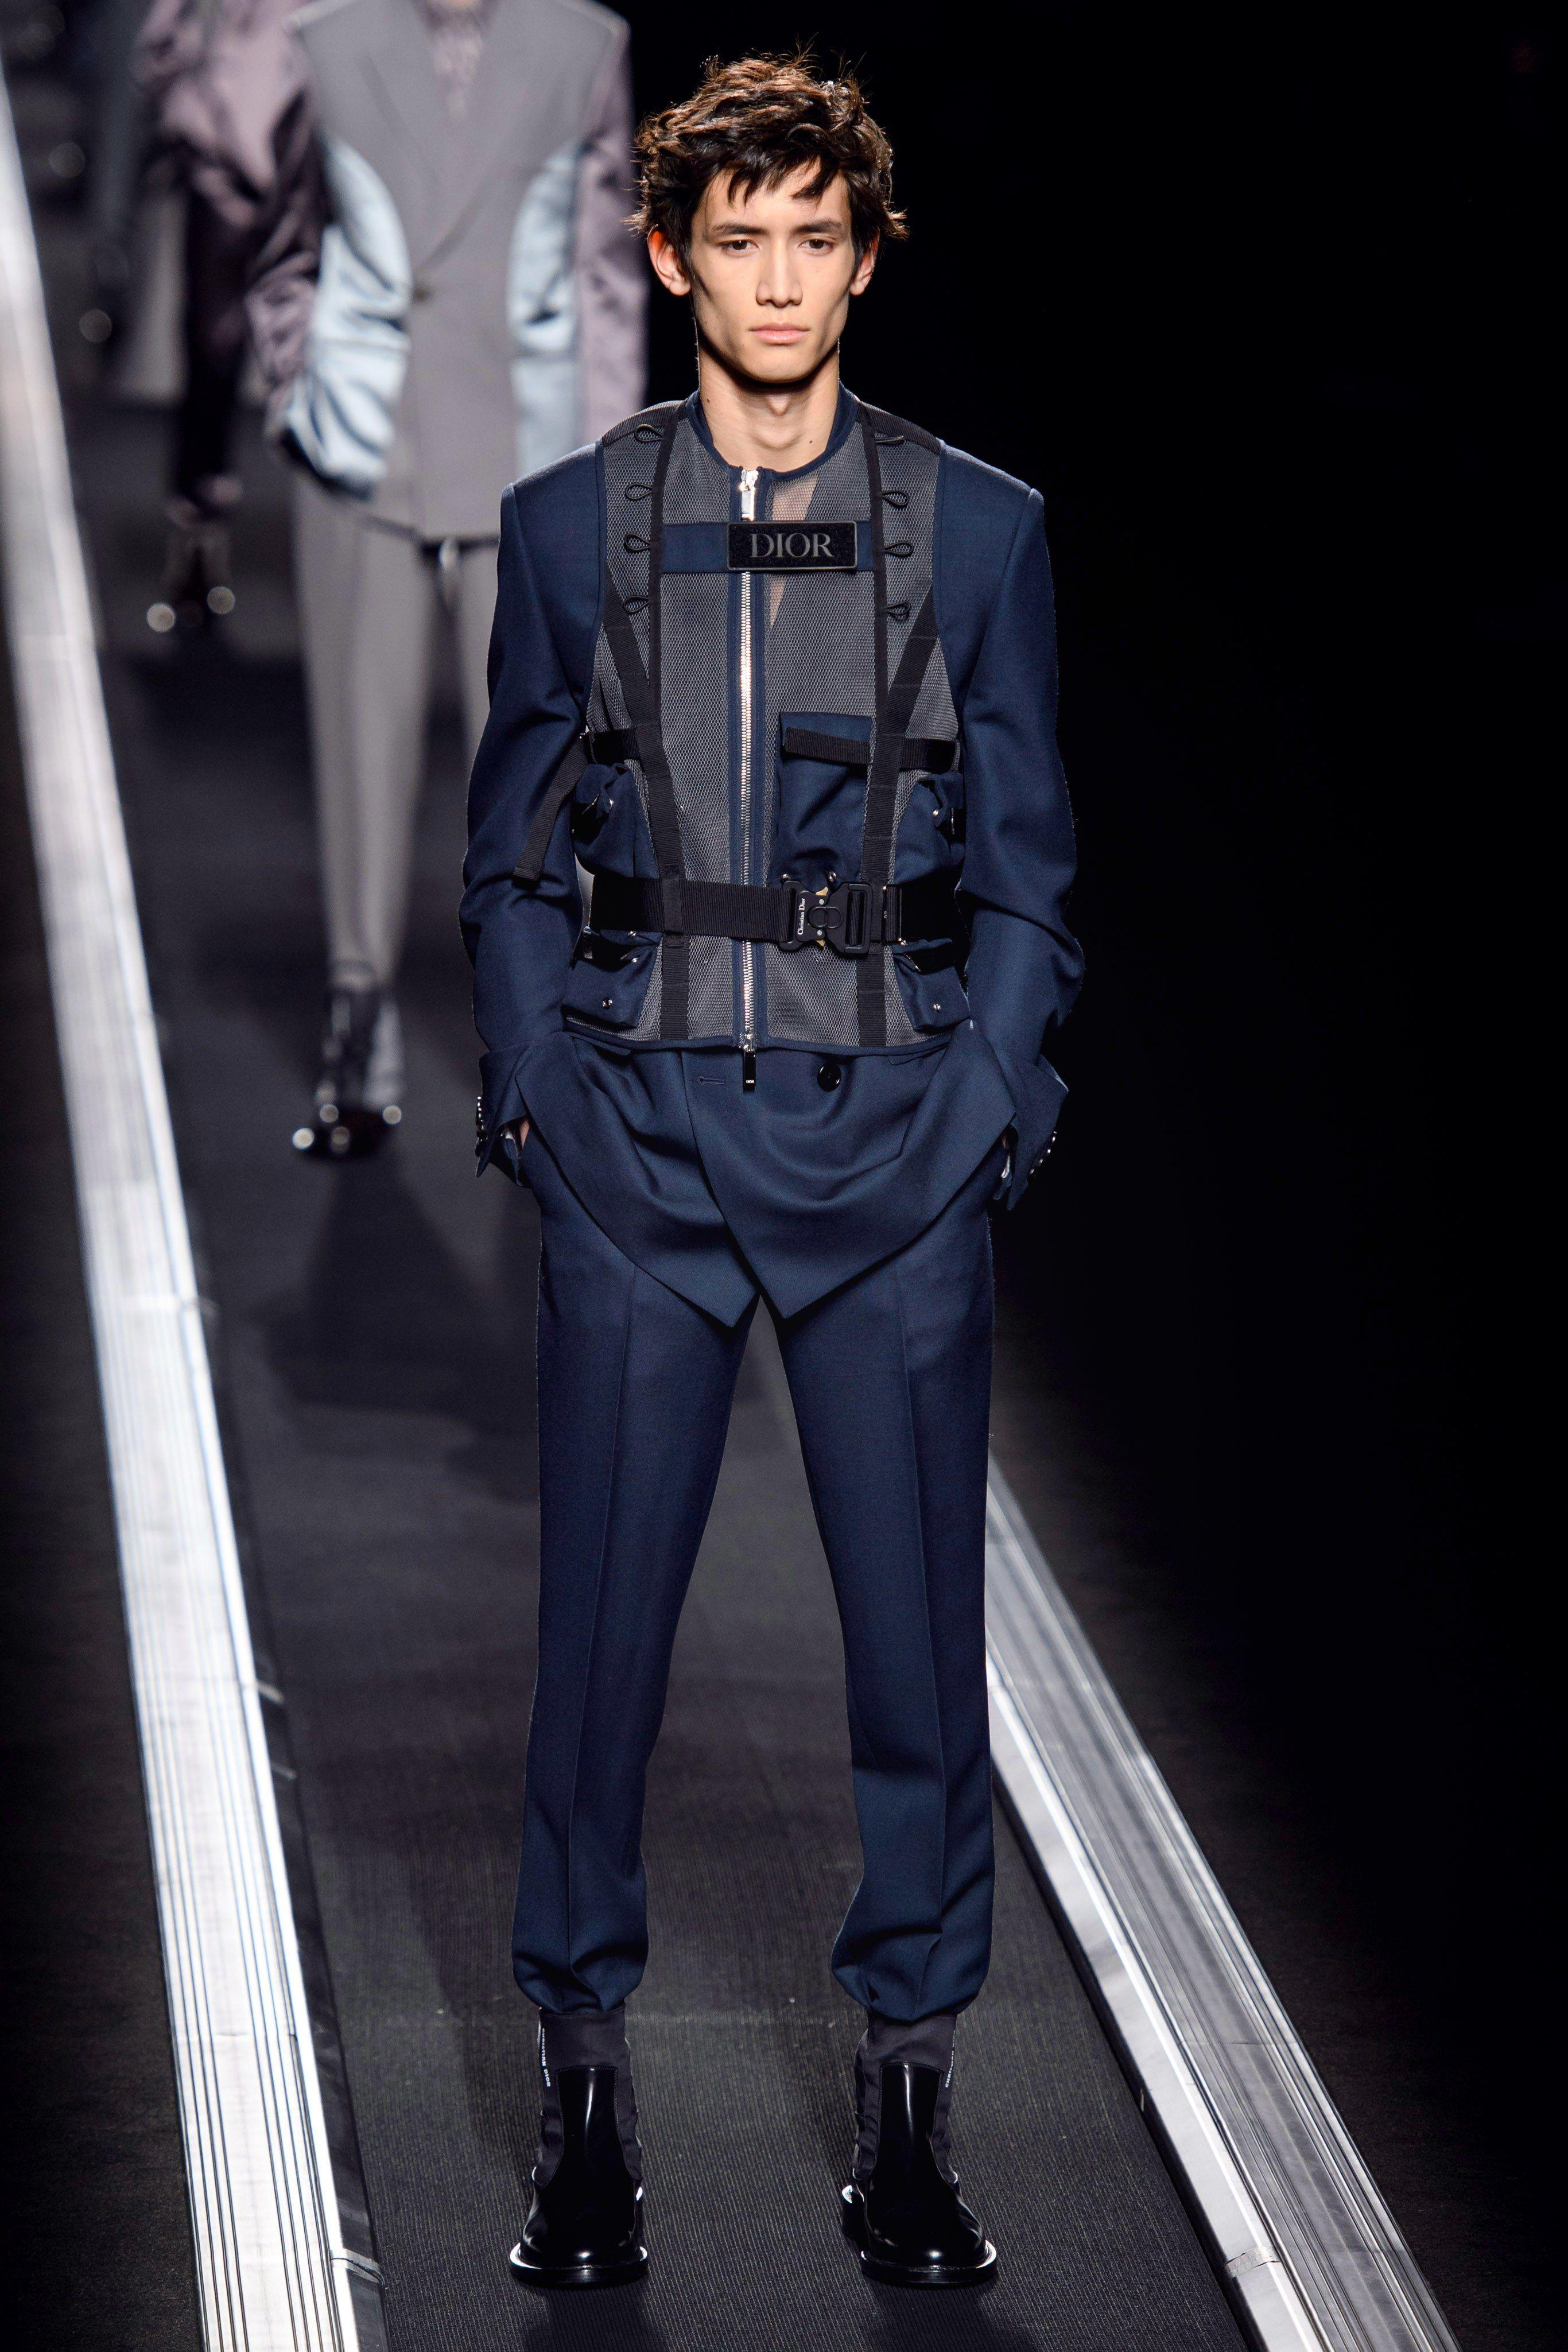 b017263a287 Dior Men Fall 2019 Menswear Fashion Show in 2019